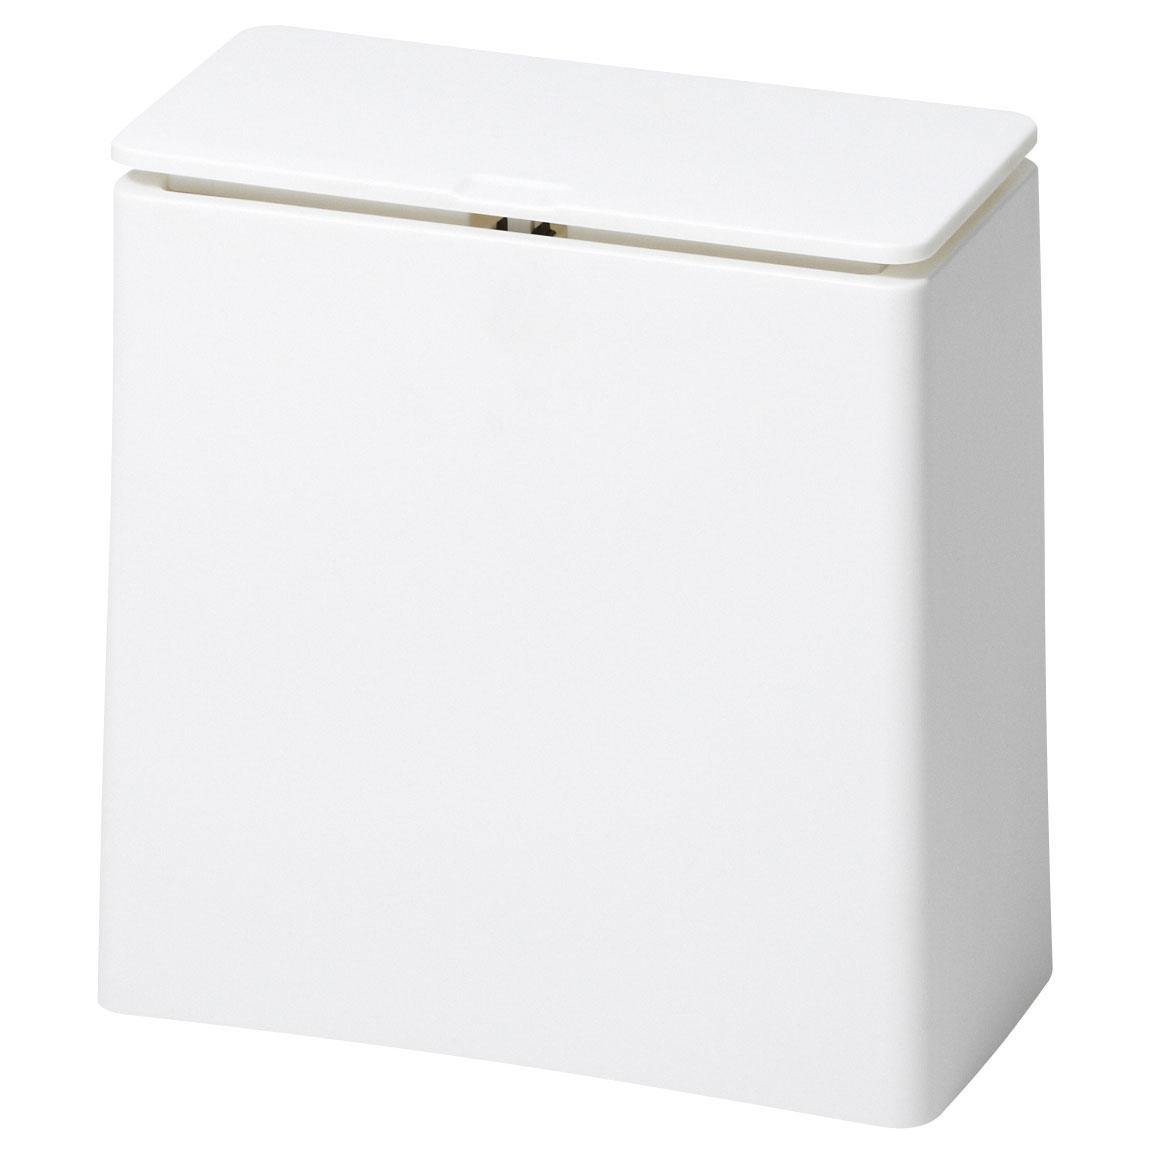 tubelor mini flap チューブラーミニフラップ   ホワイト / ideacoの写真